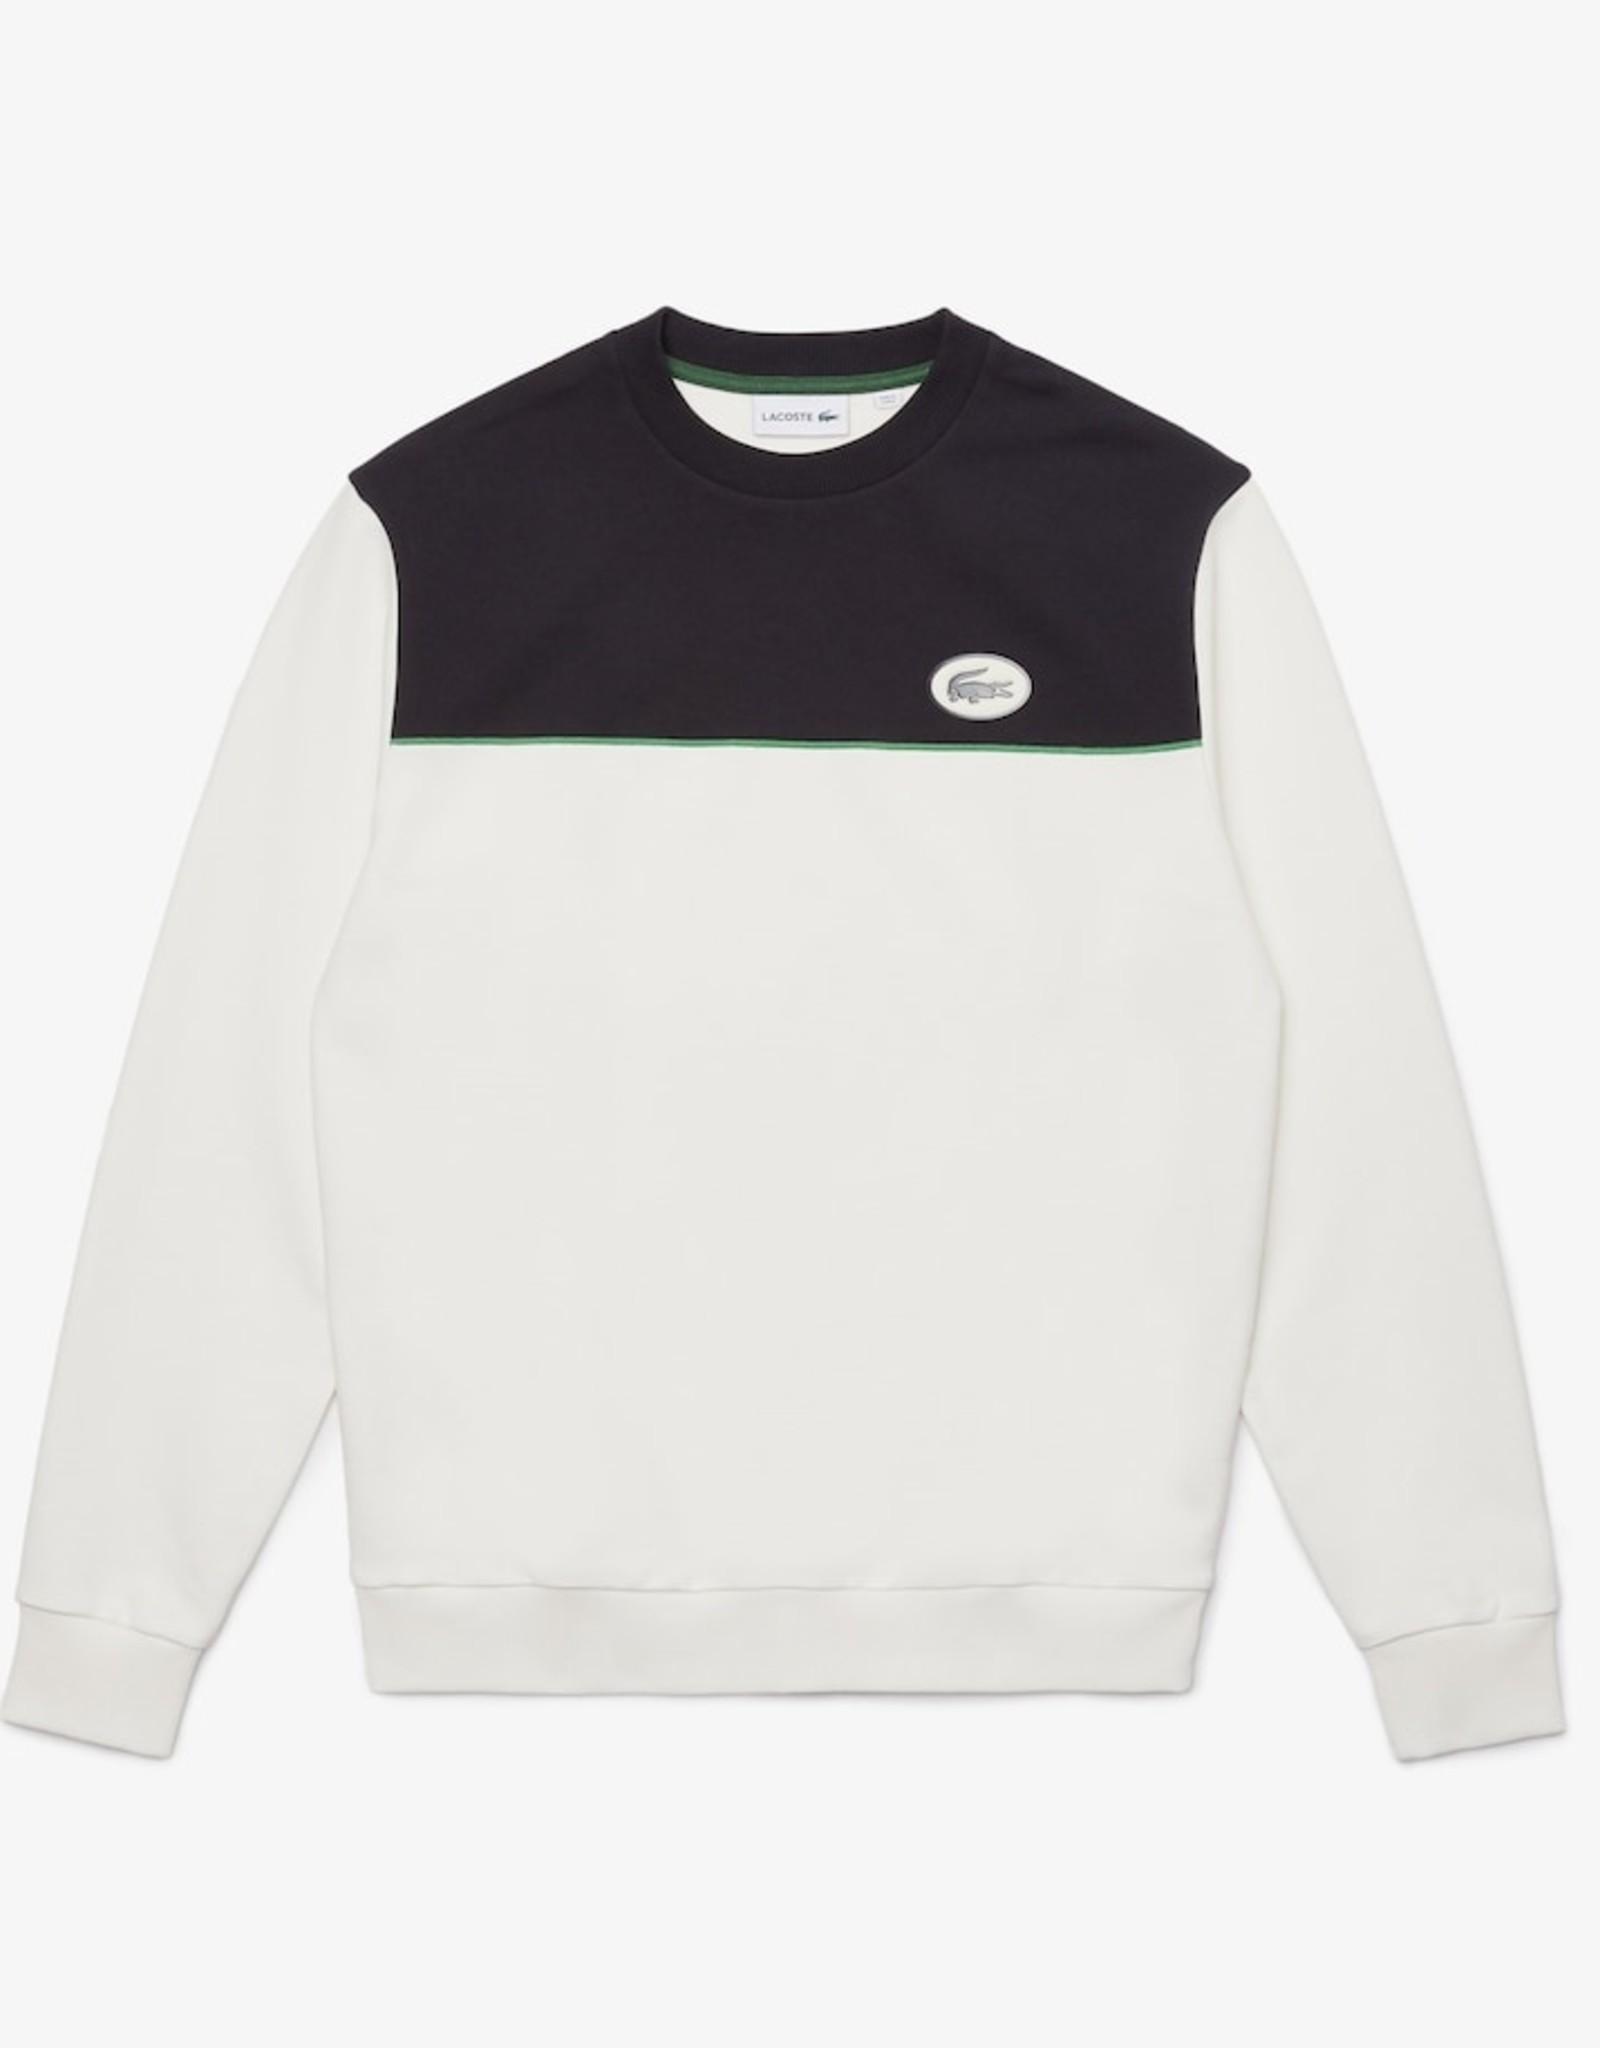 Lacoste Lacoste Colourblock Cotton Fleece Sweatshirt